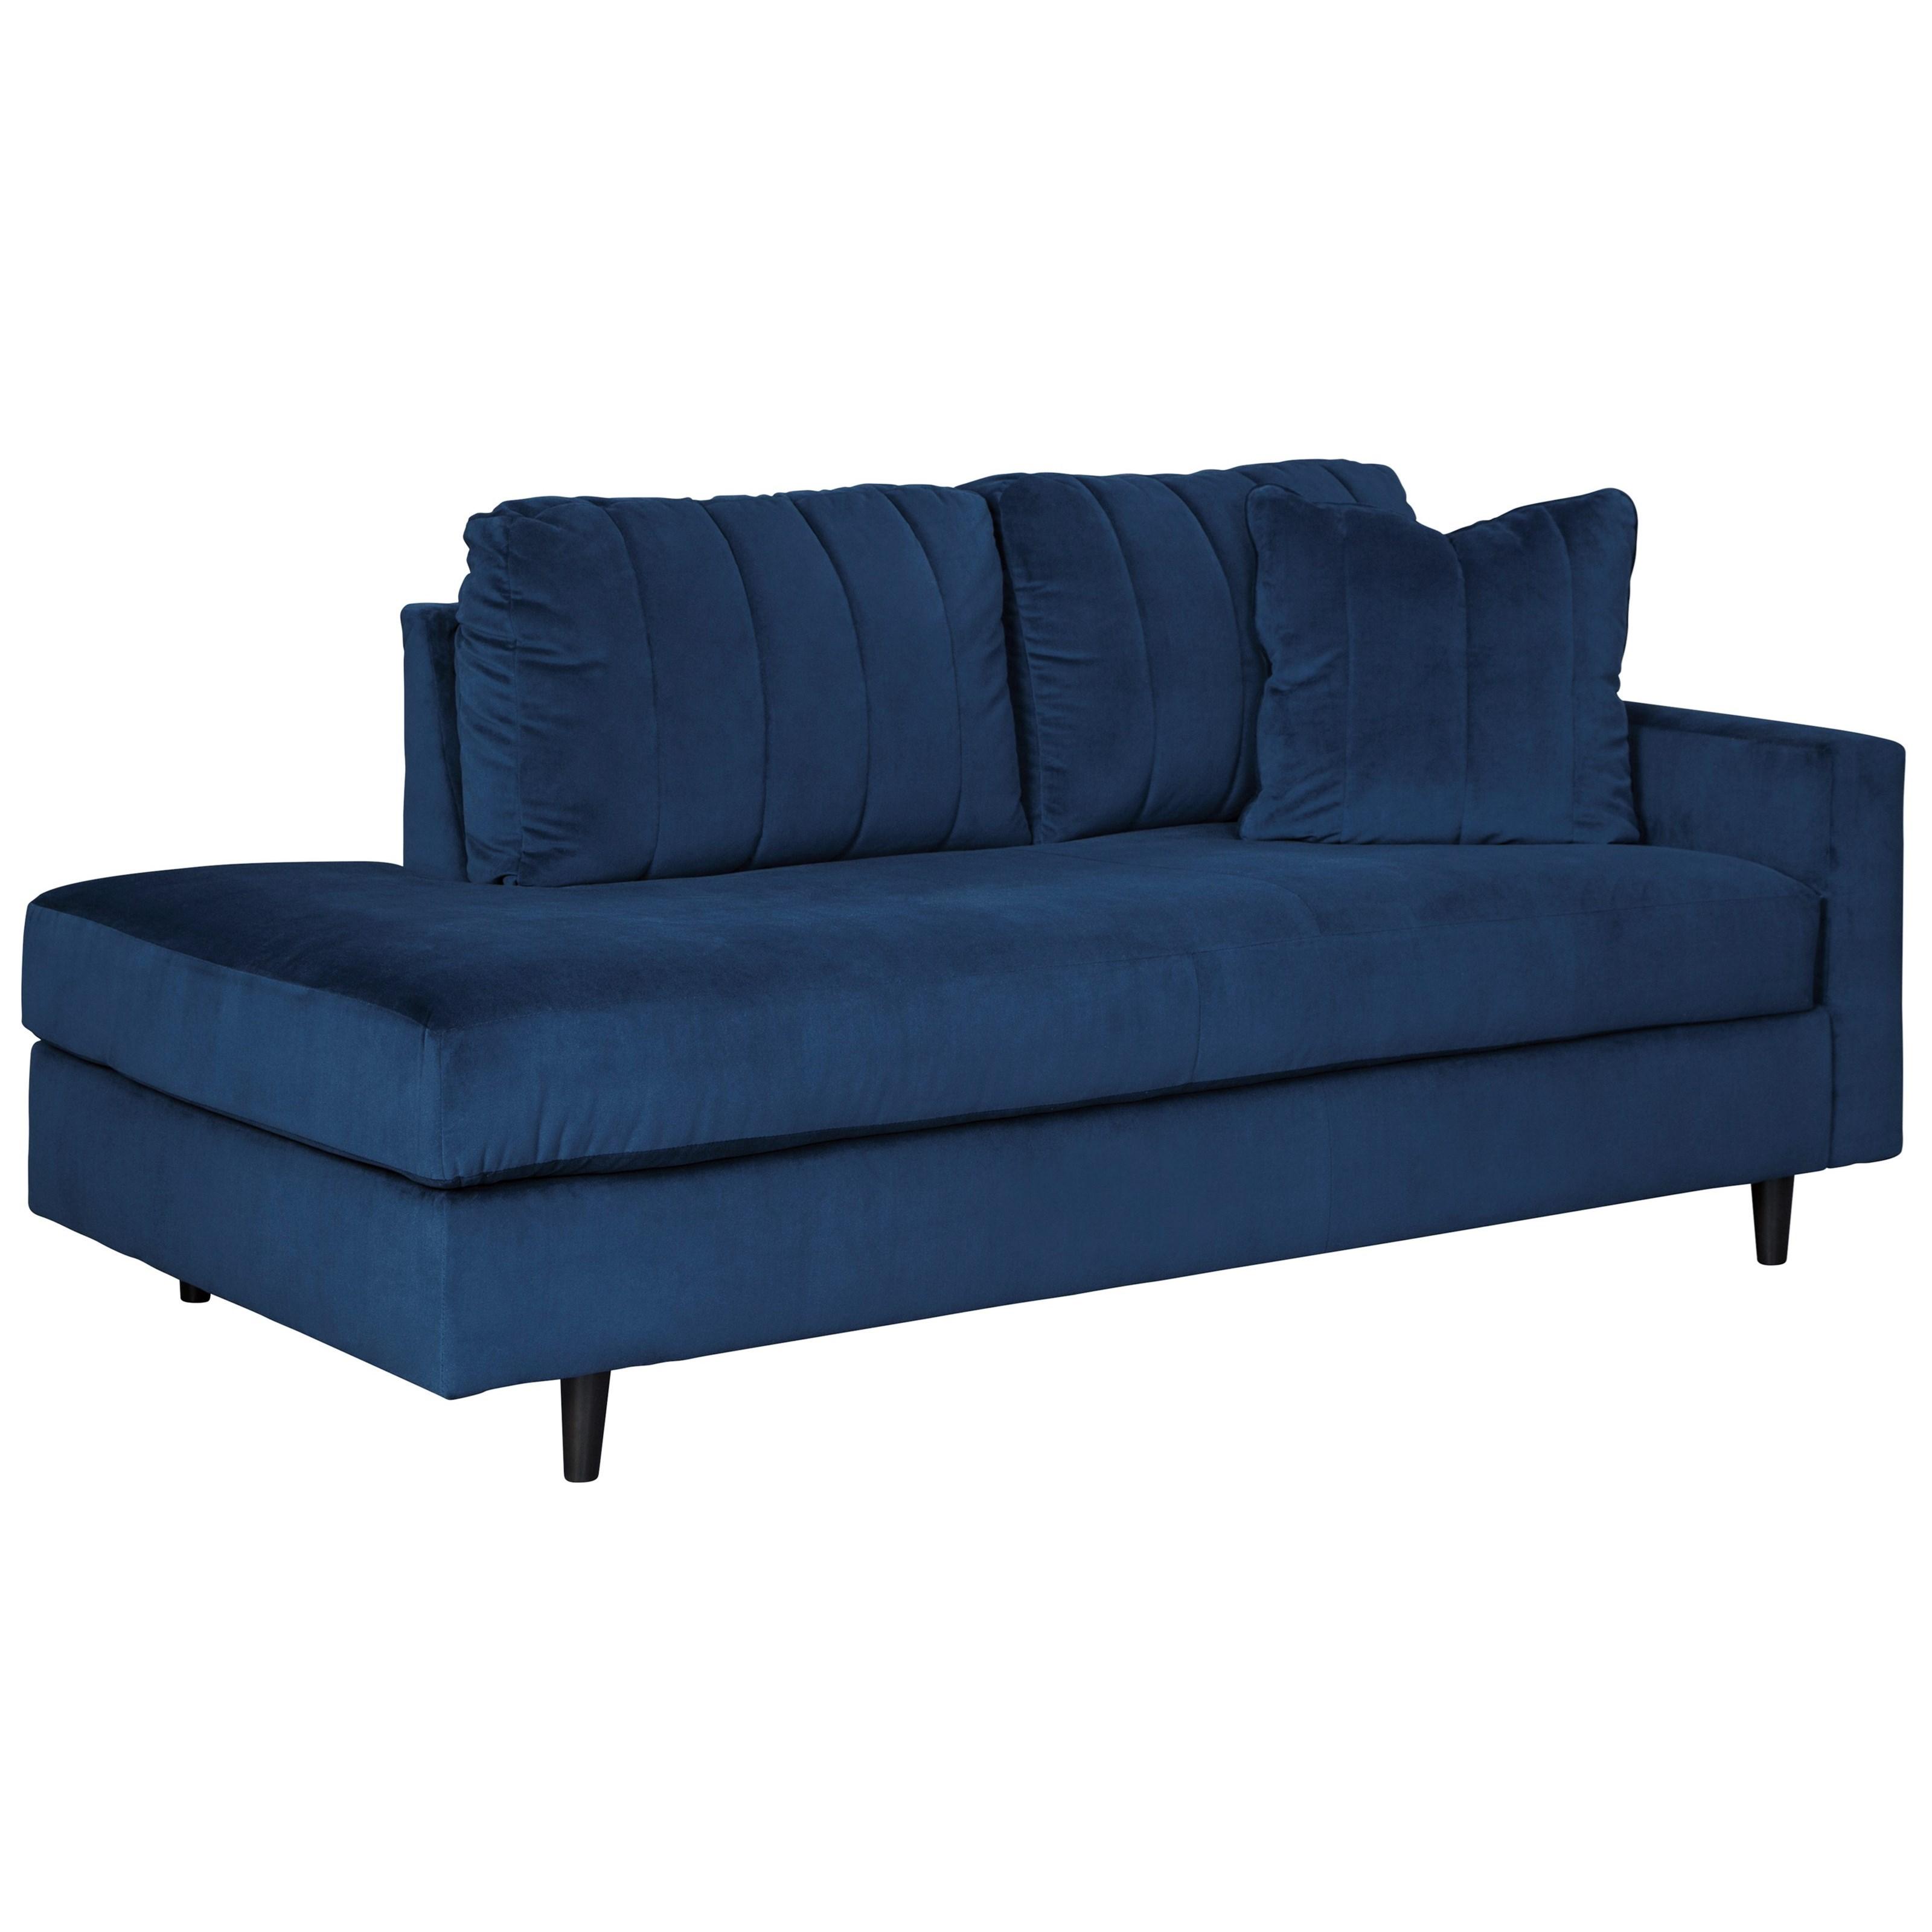 Contemporary RAF Corner Chaise in Blue Velvet Fabric